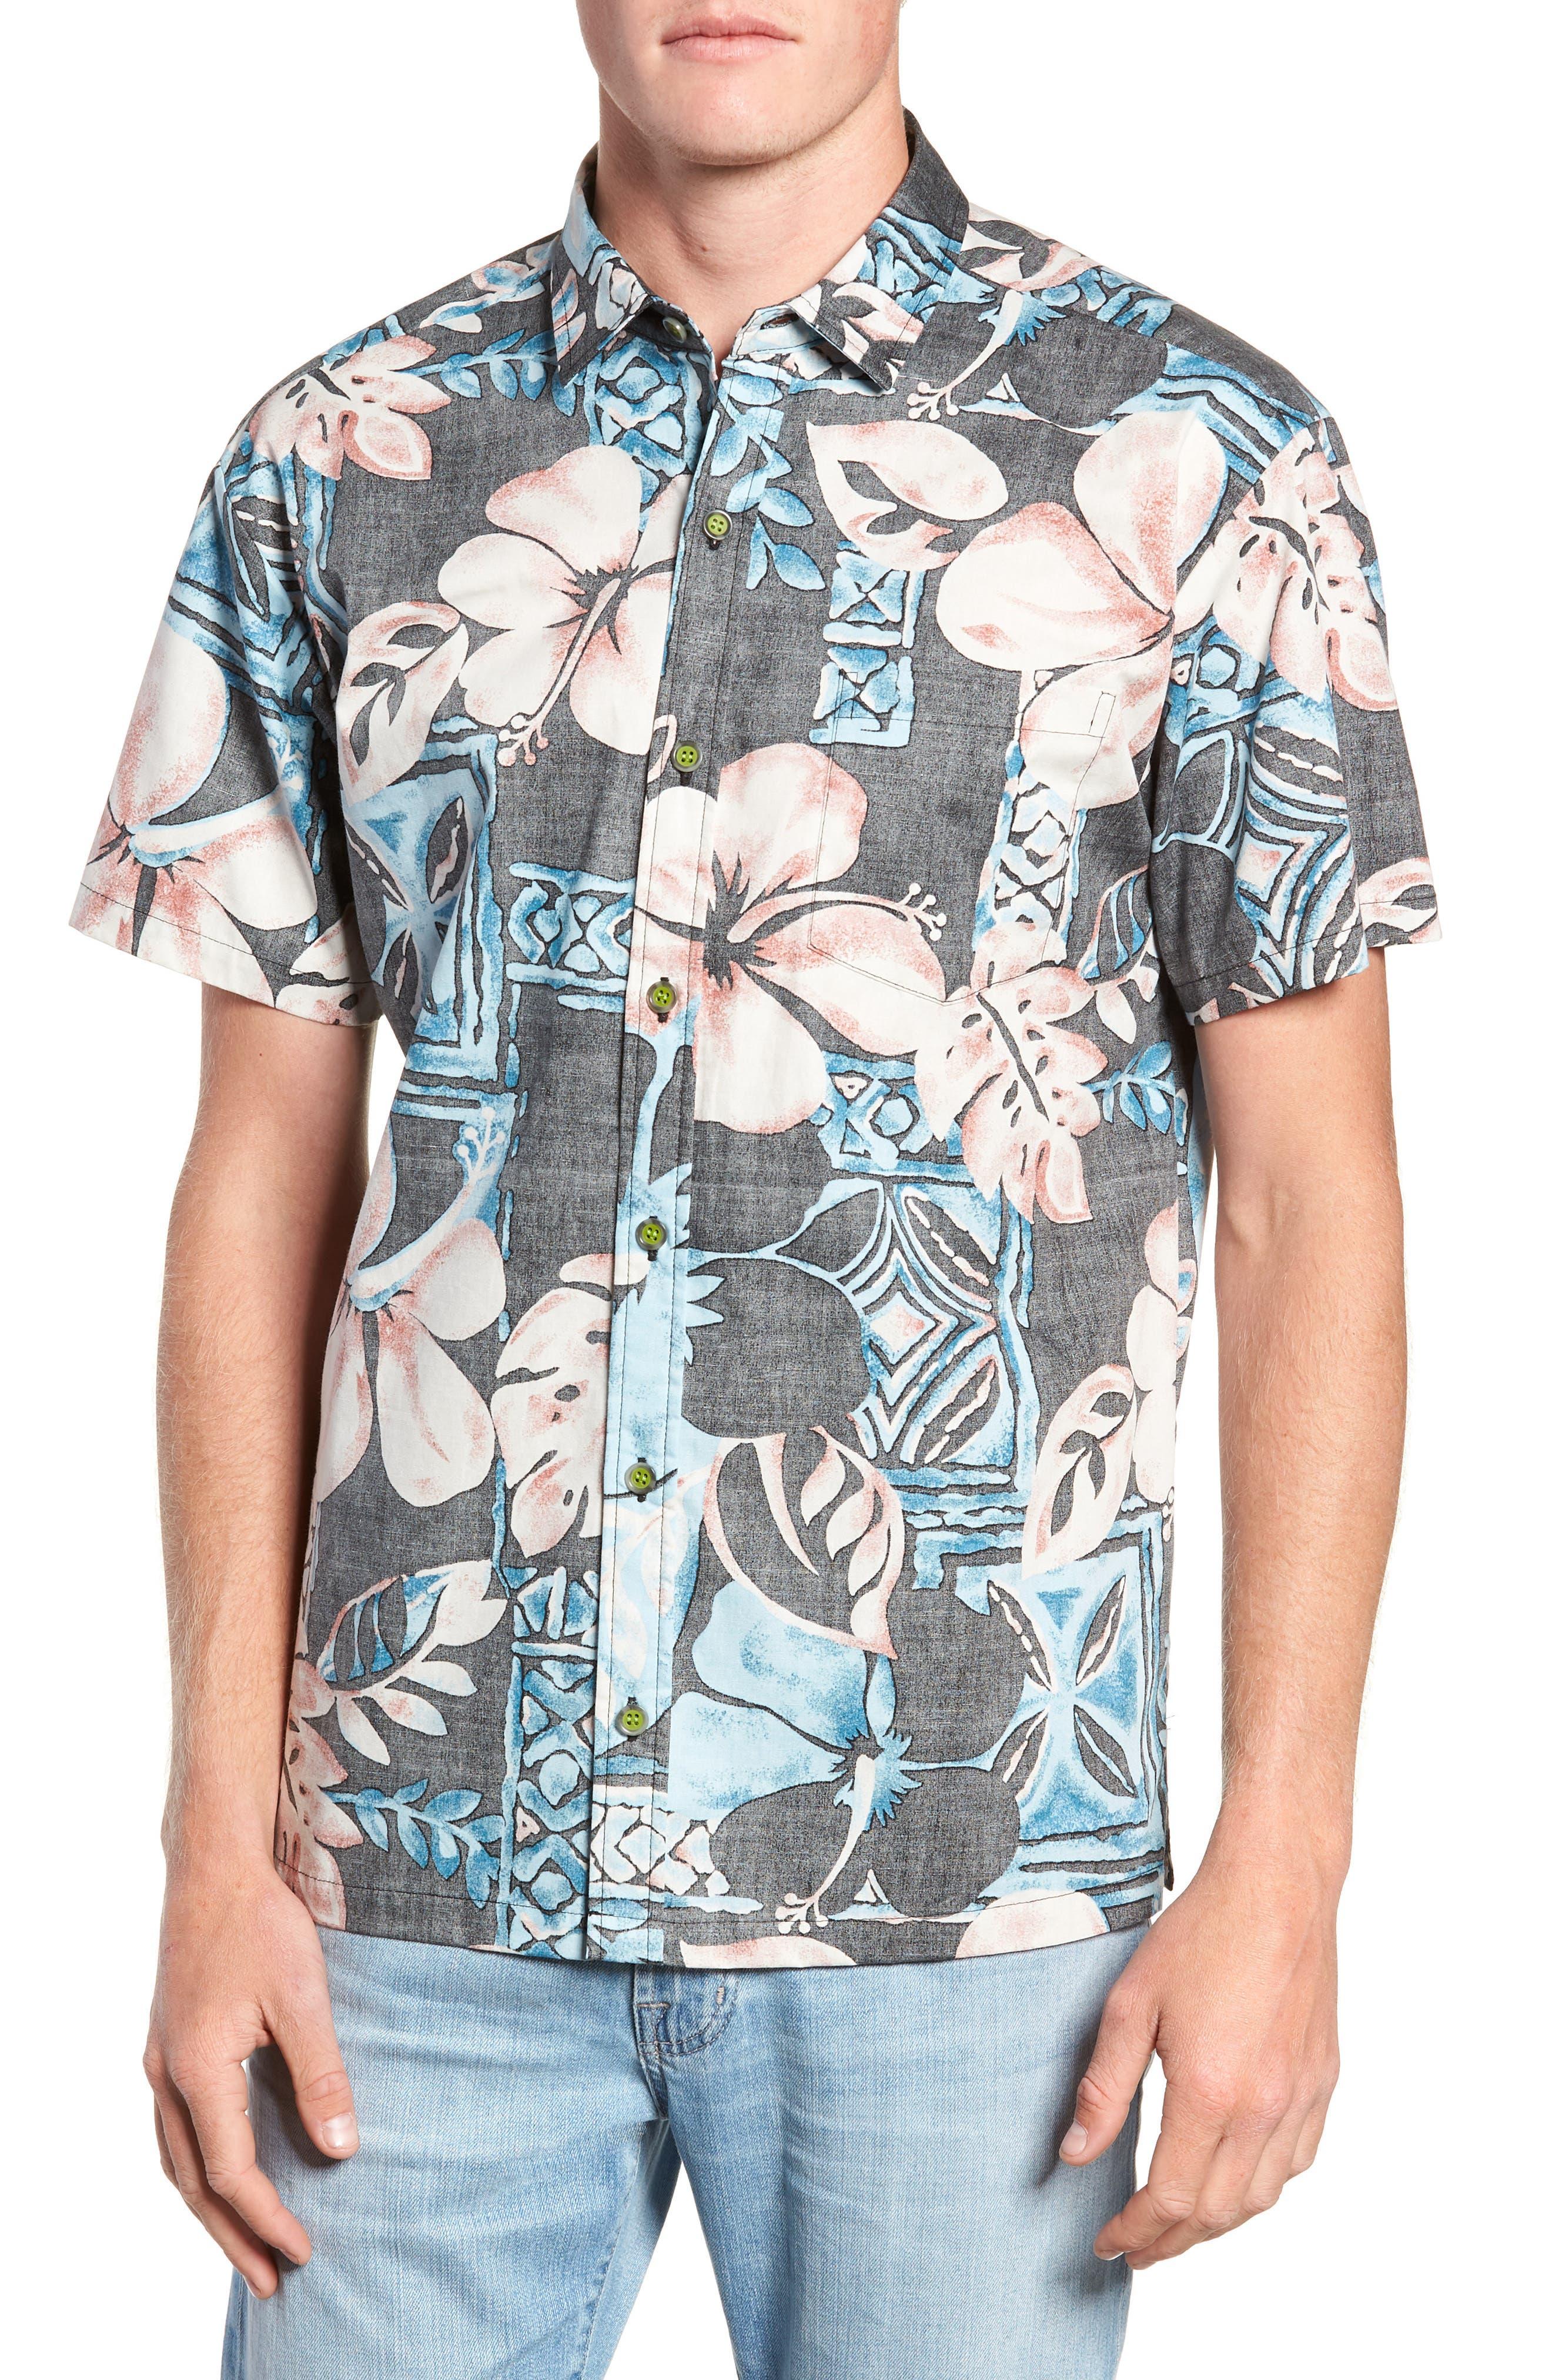 Ahiahi Classic Fit Sport Shirt,                             Main thumbnail 1, color,                             BLACK